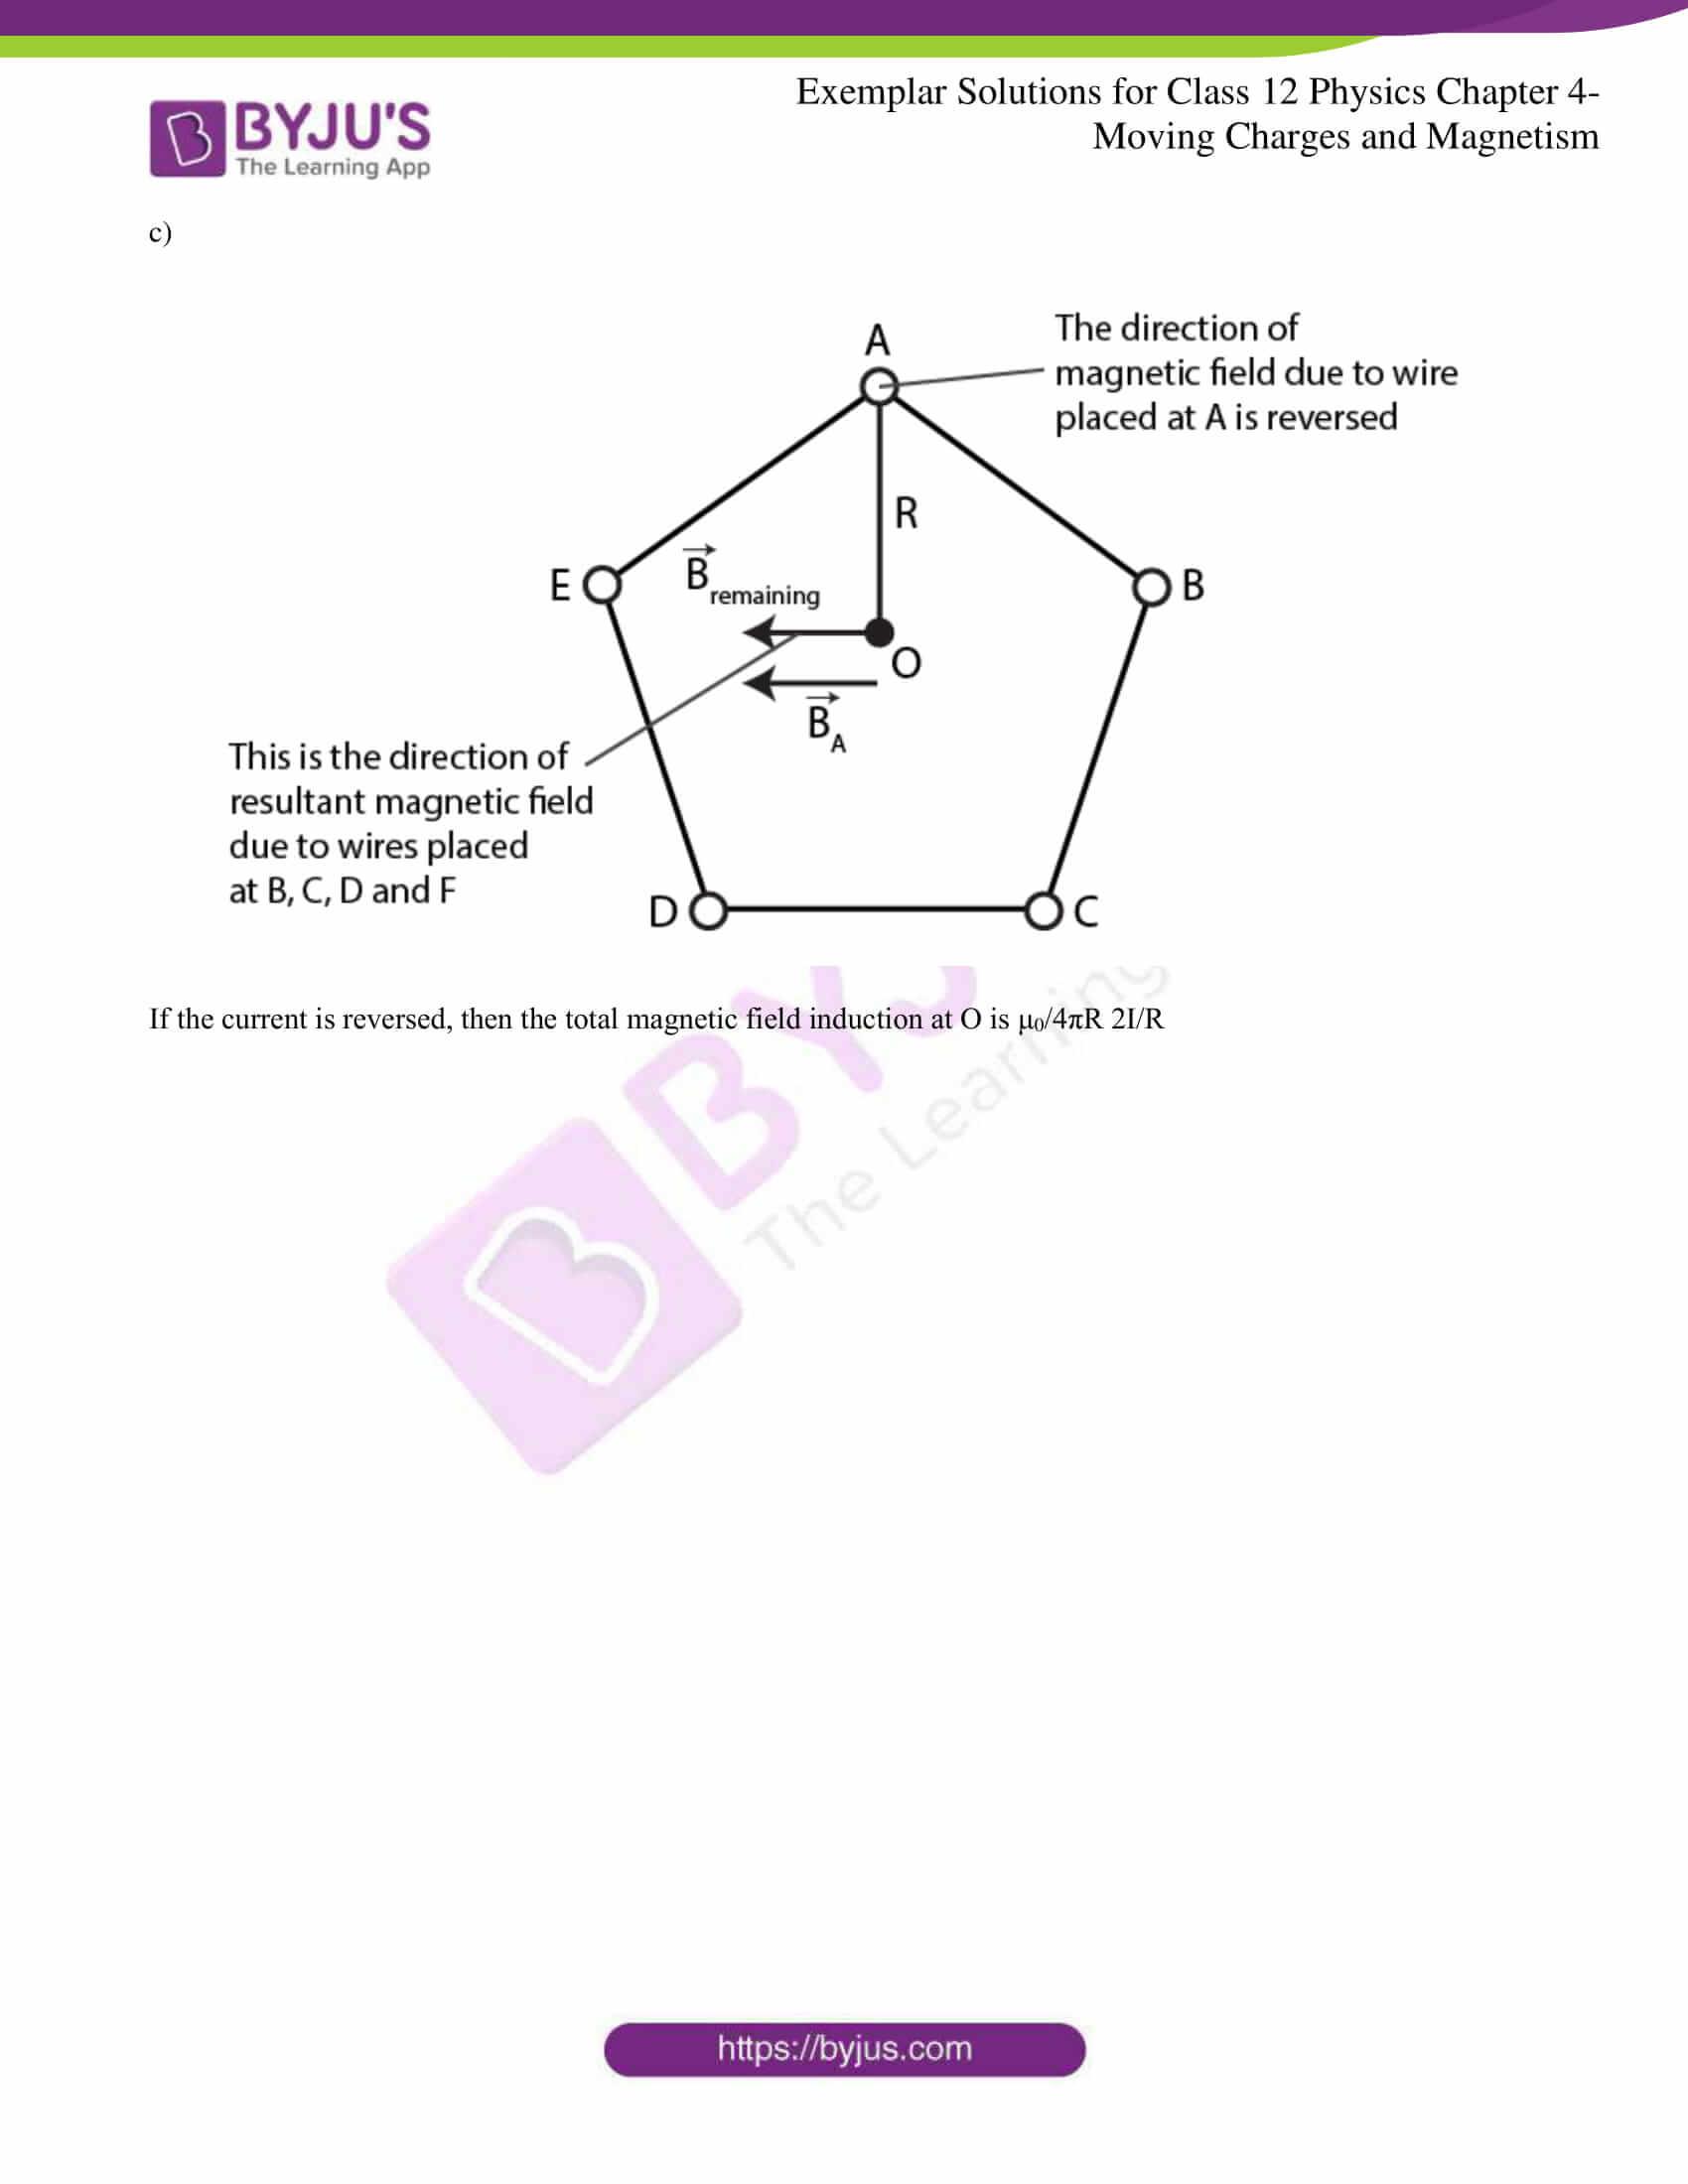 ncert exemplar solutions for class 12 physics chapter 4 14